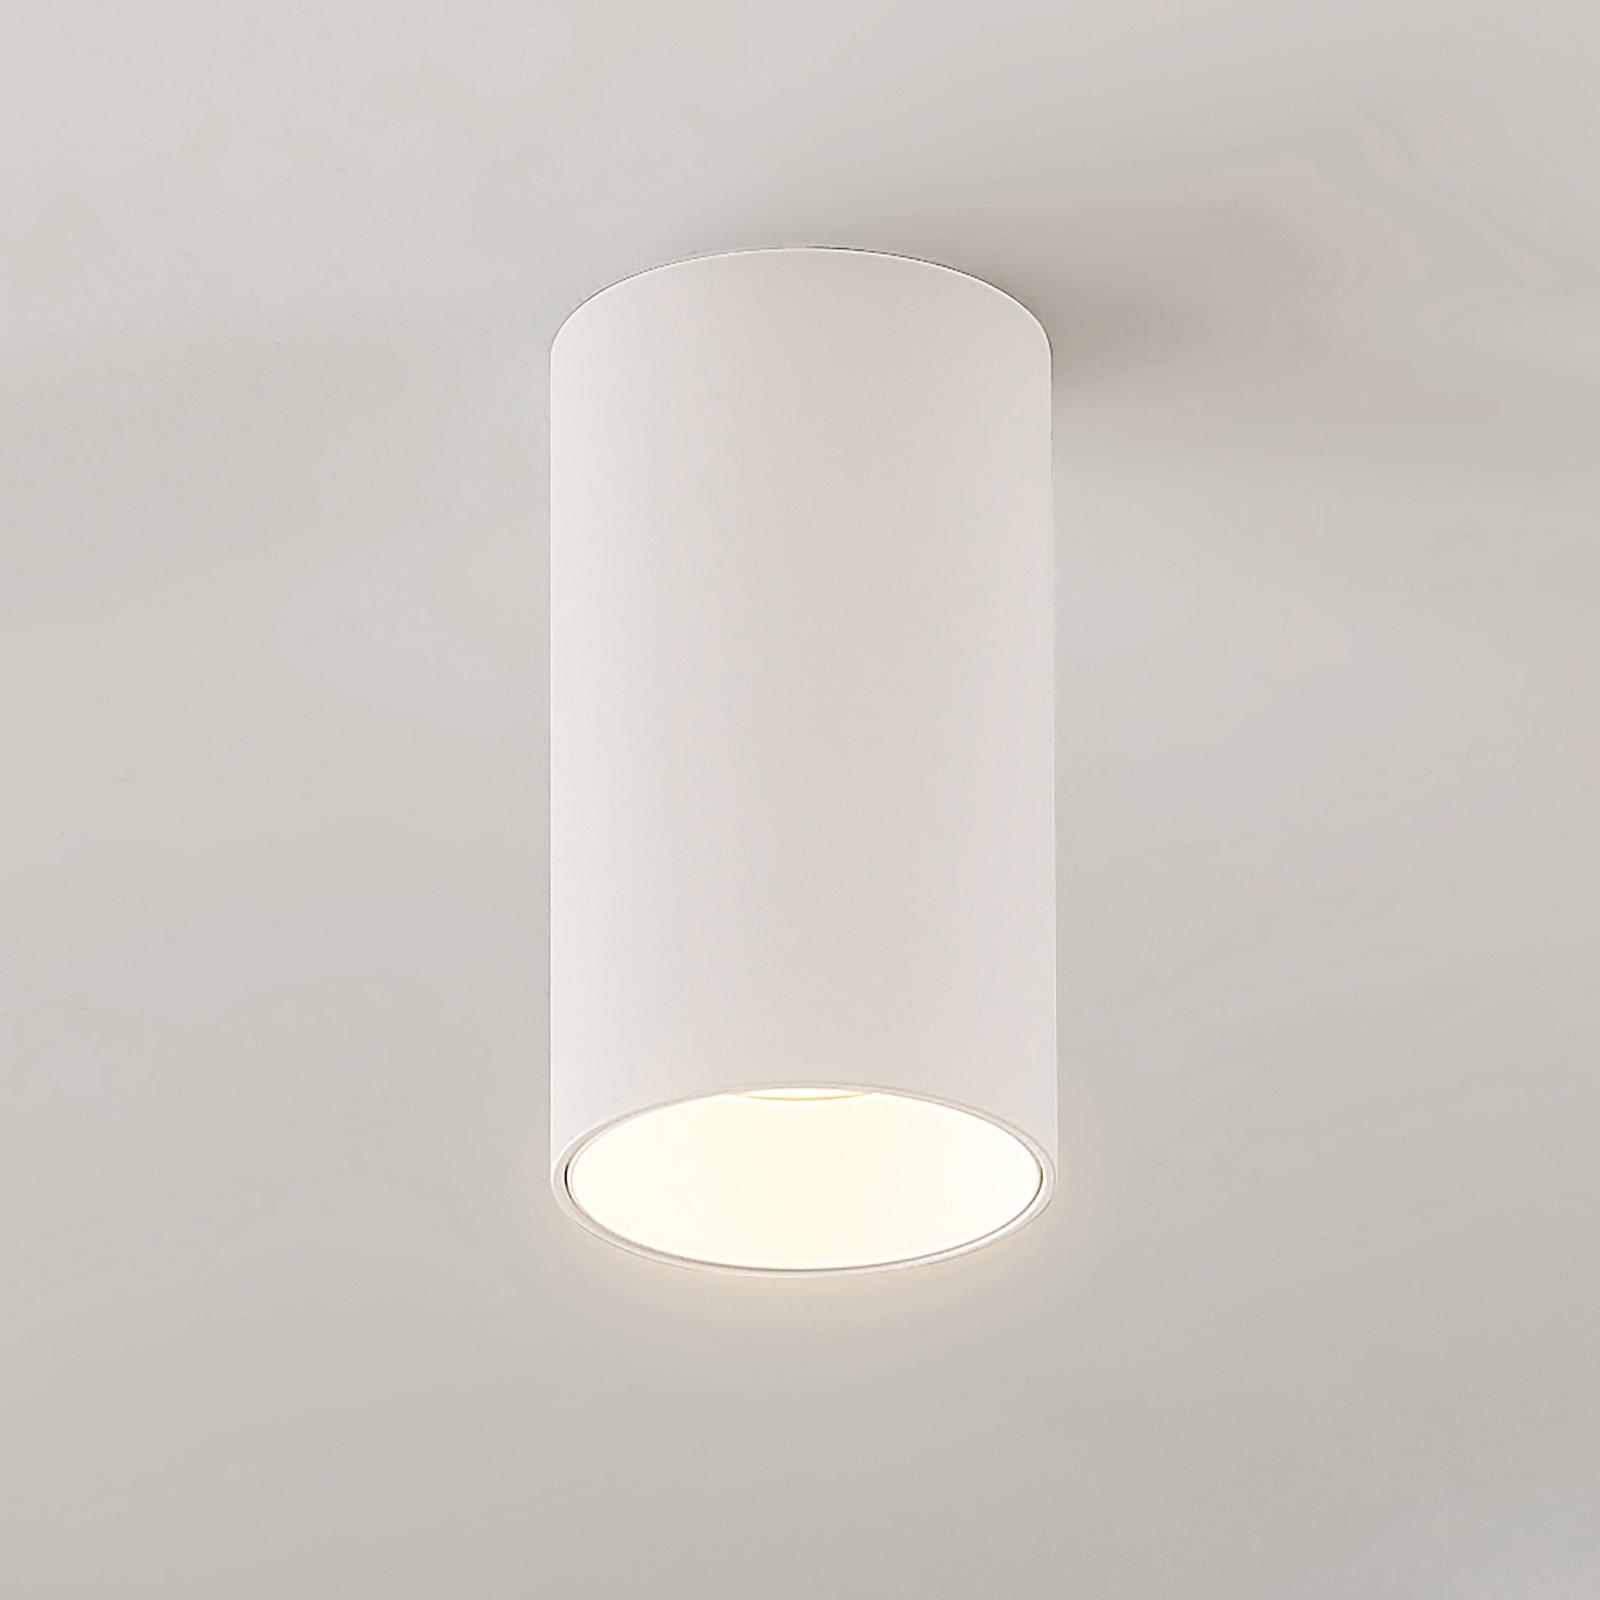 Arcchio Dilana downlight, rond, GU10, blanc